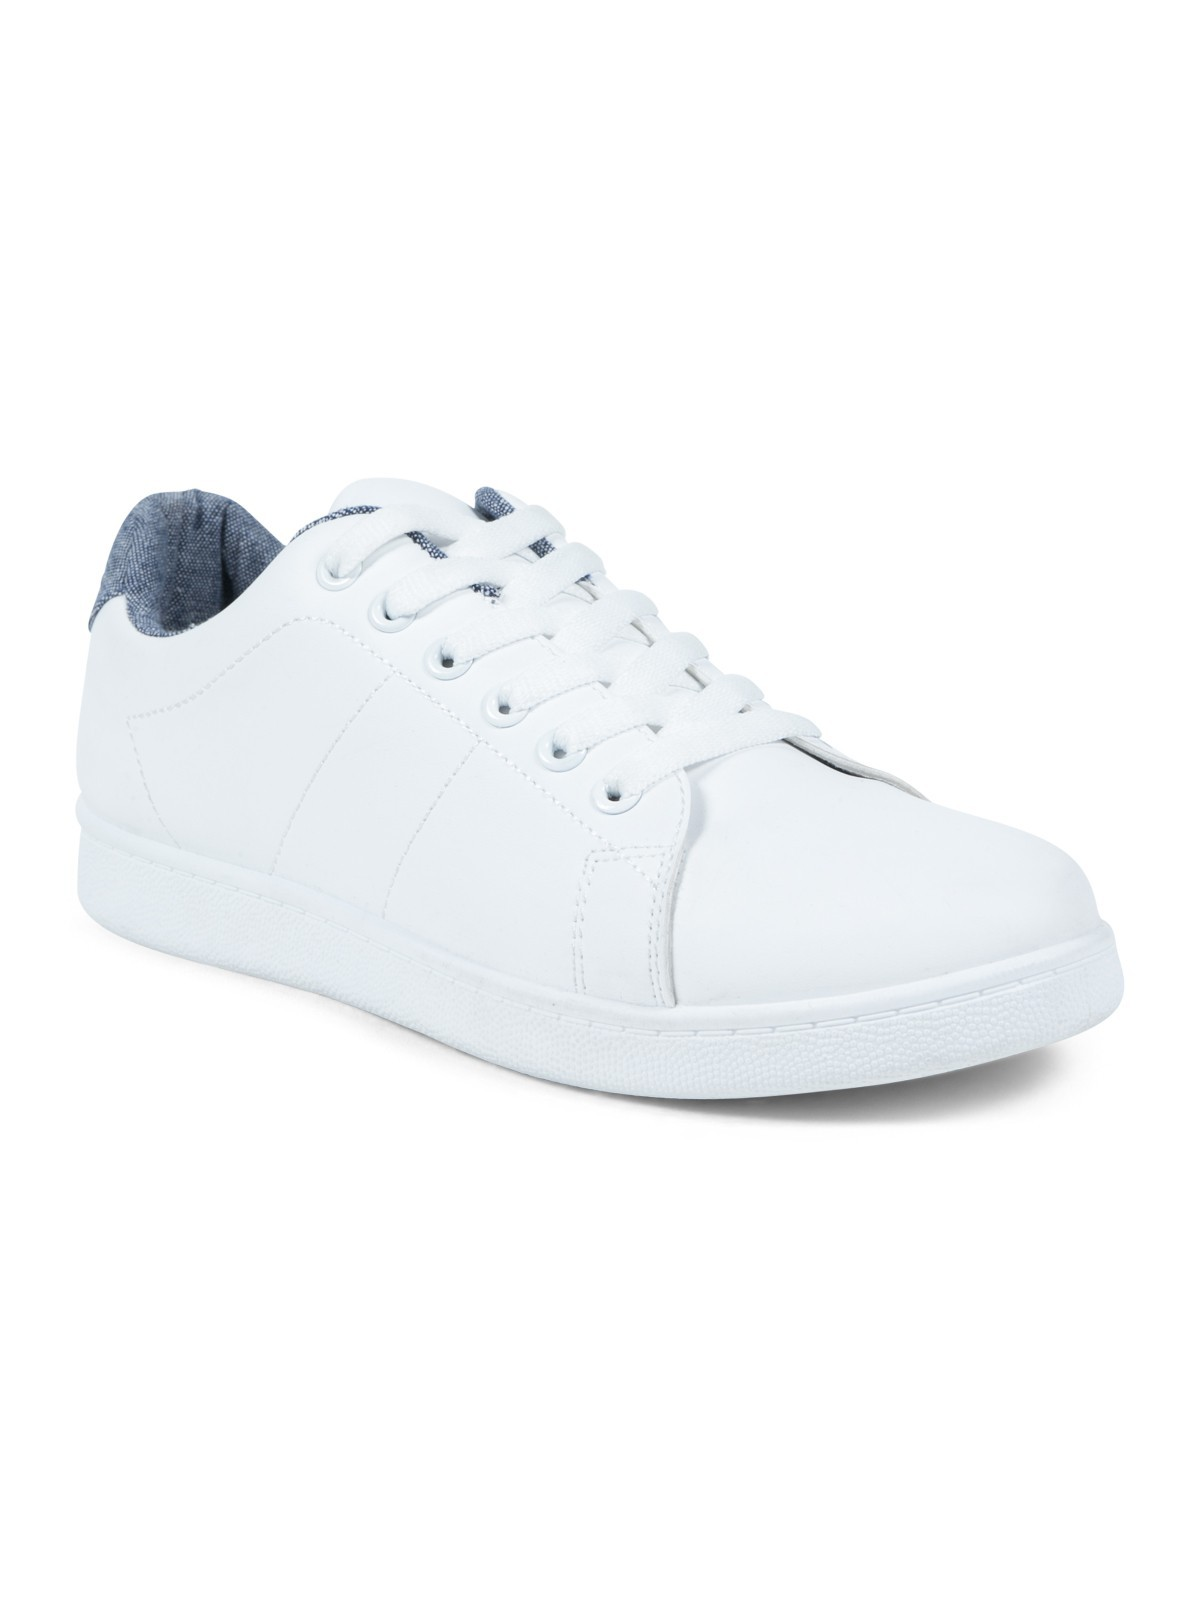 83b479c62b1b3 Basket mode garçon blanc (36-39) - DistriCenter